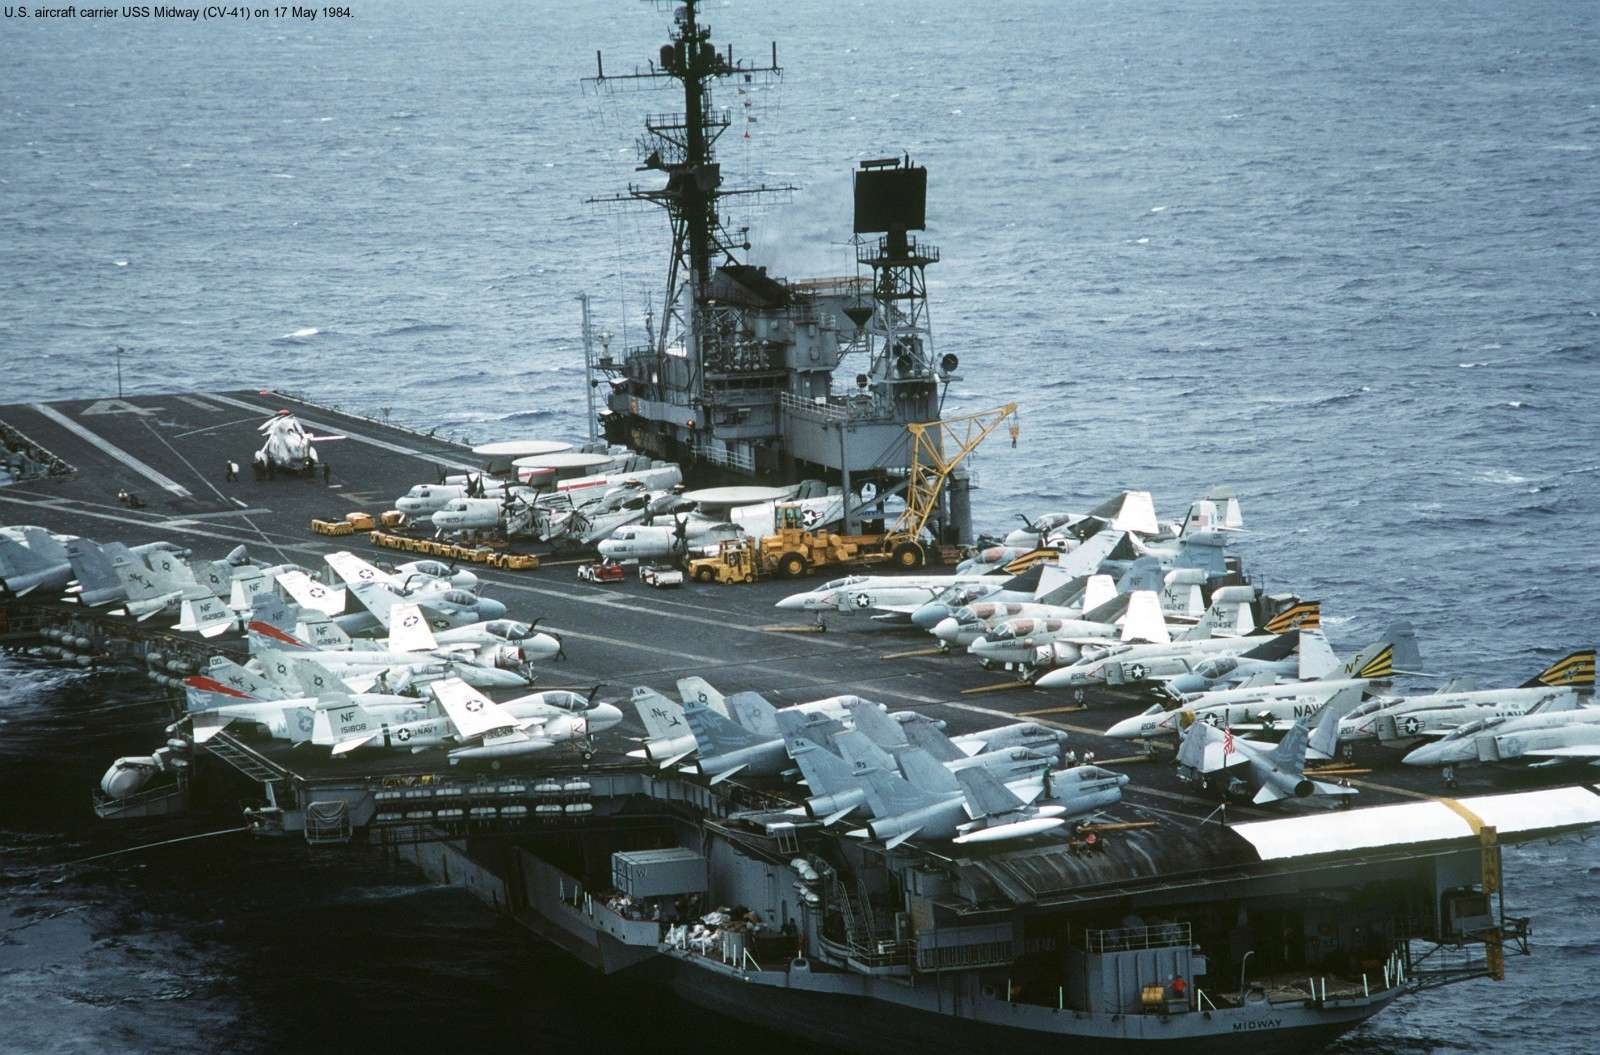 [USS Midway CVA-41] Porte avions lourd américain-700e-Orange Hobby - Page 2 9rru5t11